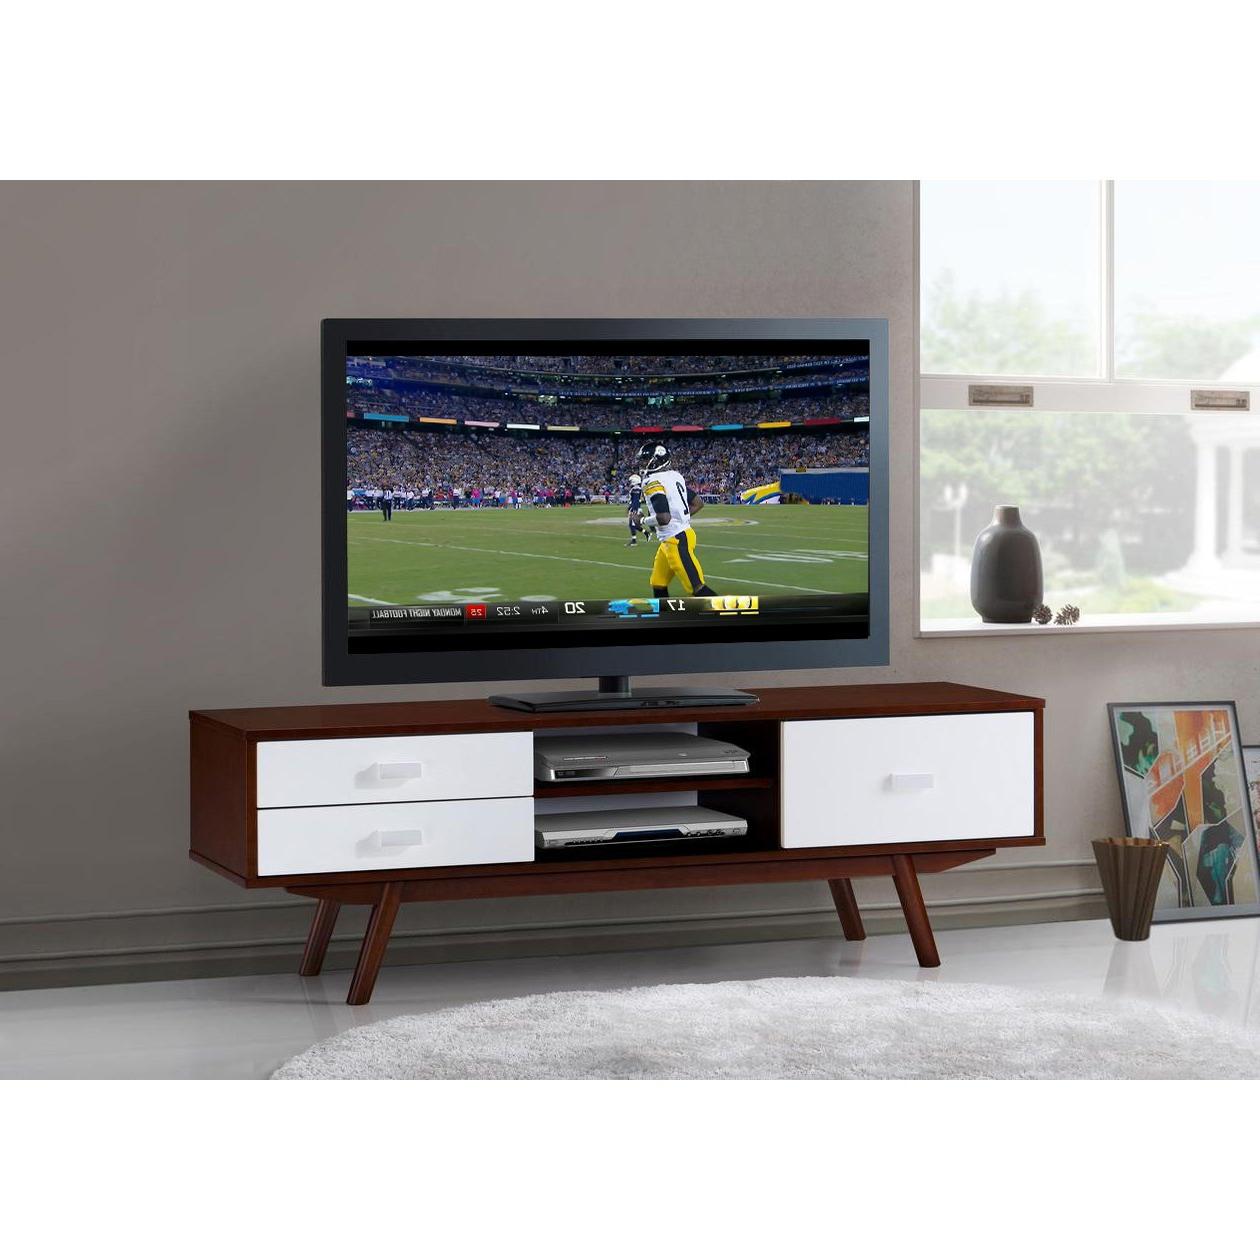 2018 Rowan 64 Inch Tv Stands Regarding Shop Urban Designs Retro Wood Veneer Walnut 65 Tv Stand With Storage (View 2 of 20)